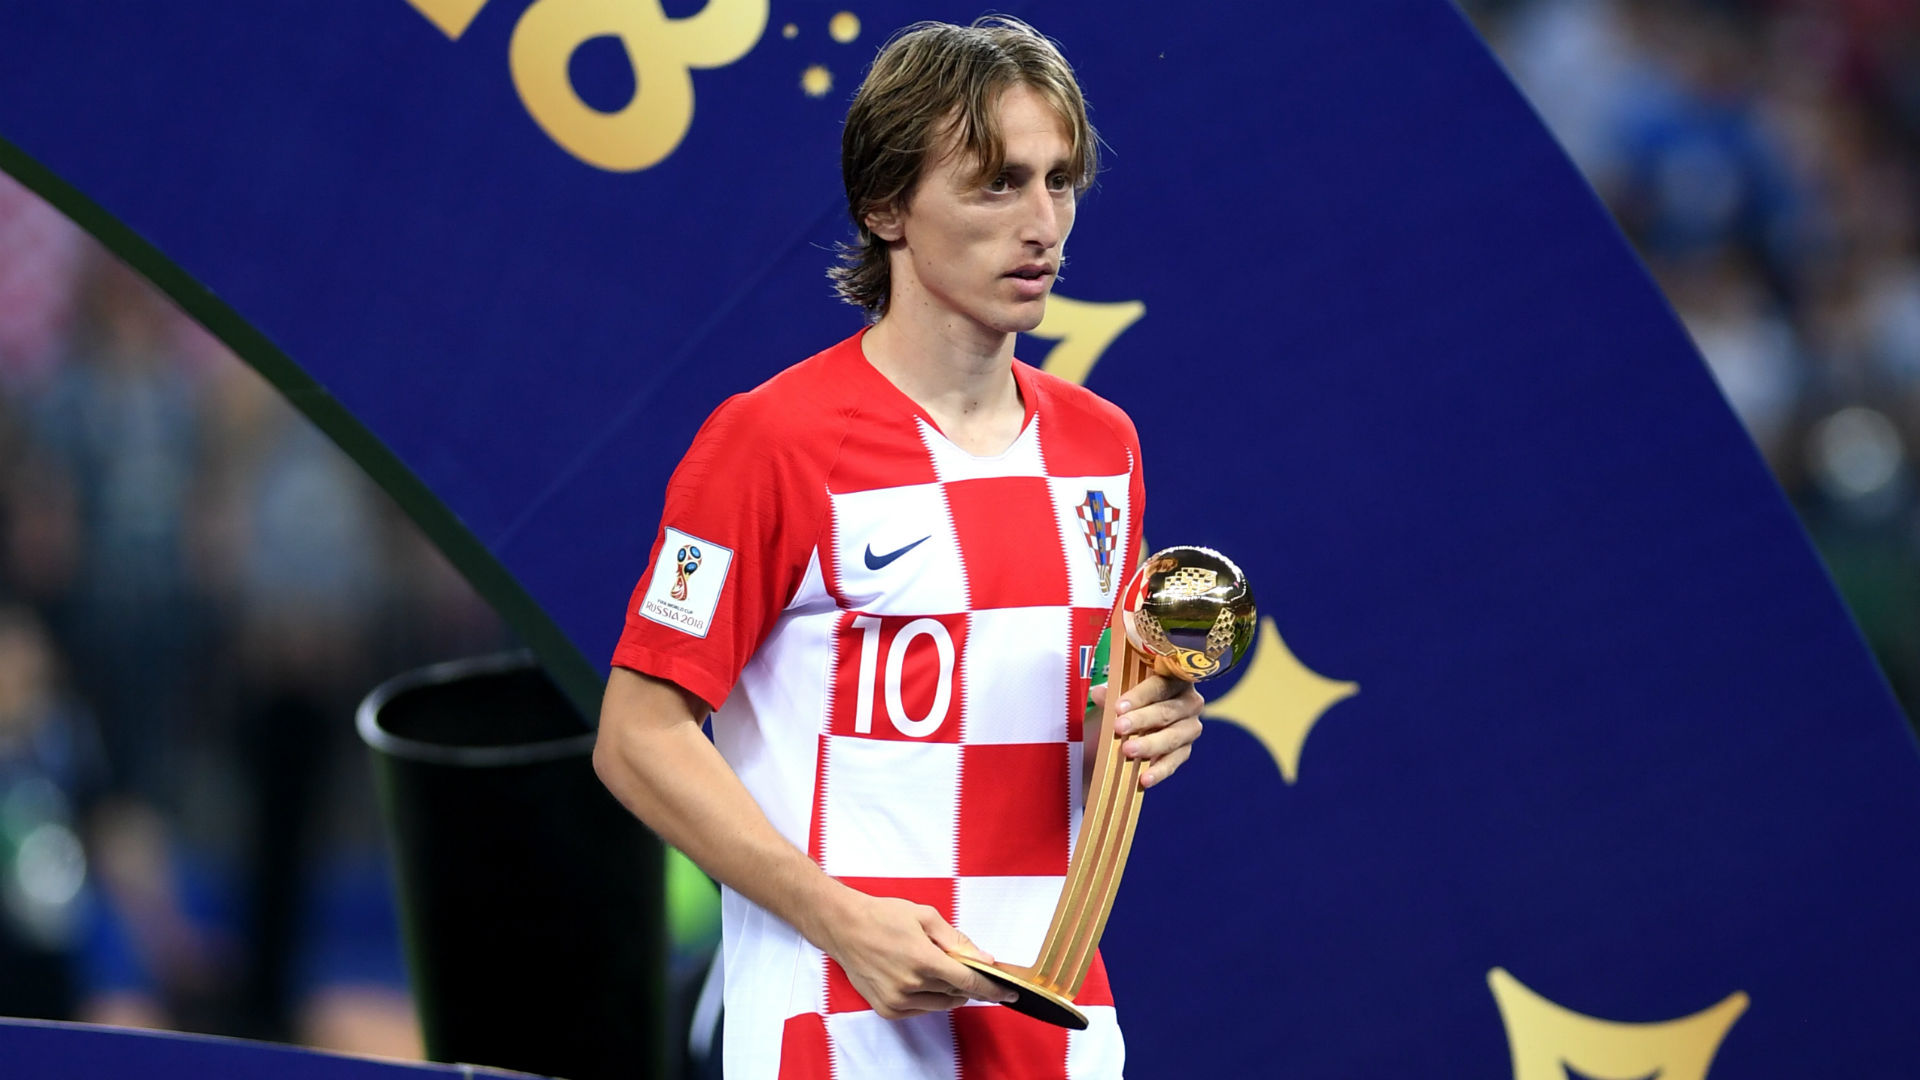 Luka Modric Croatia France World Cup 2018 final